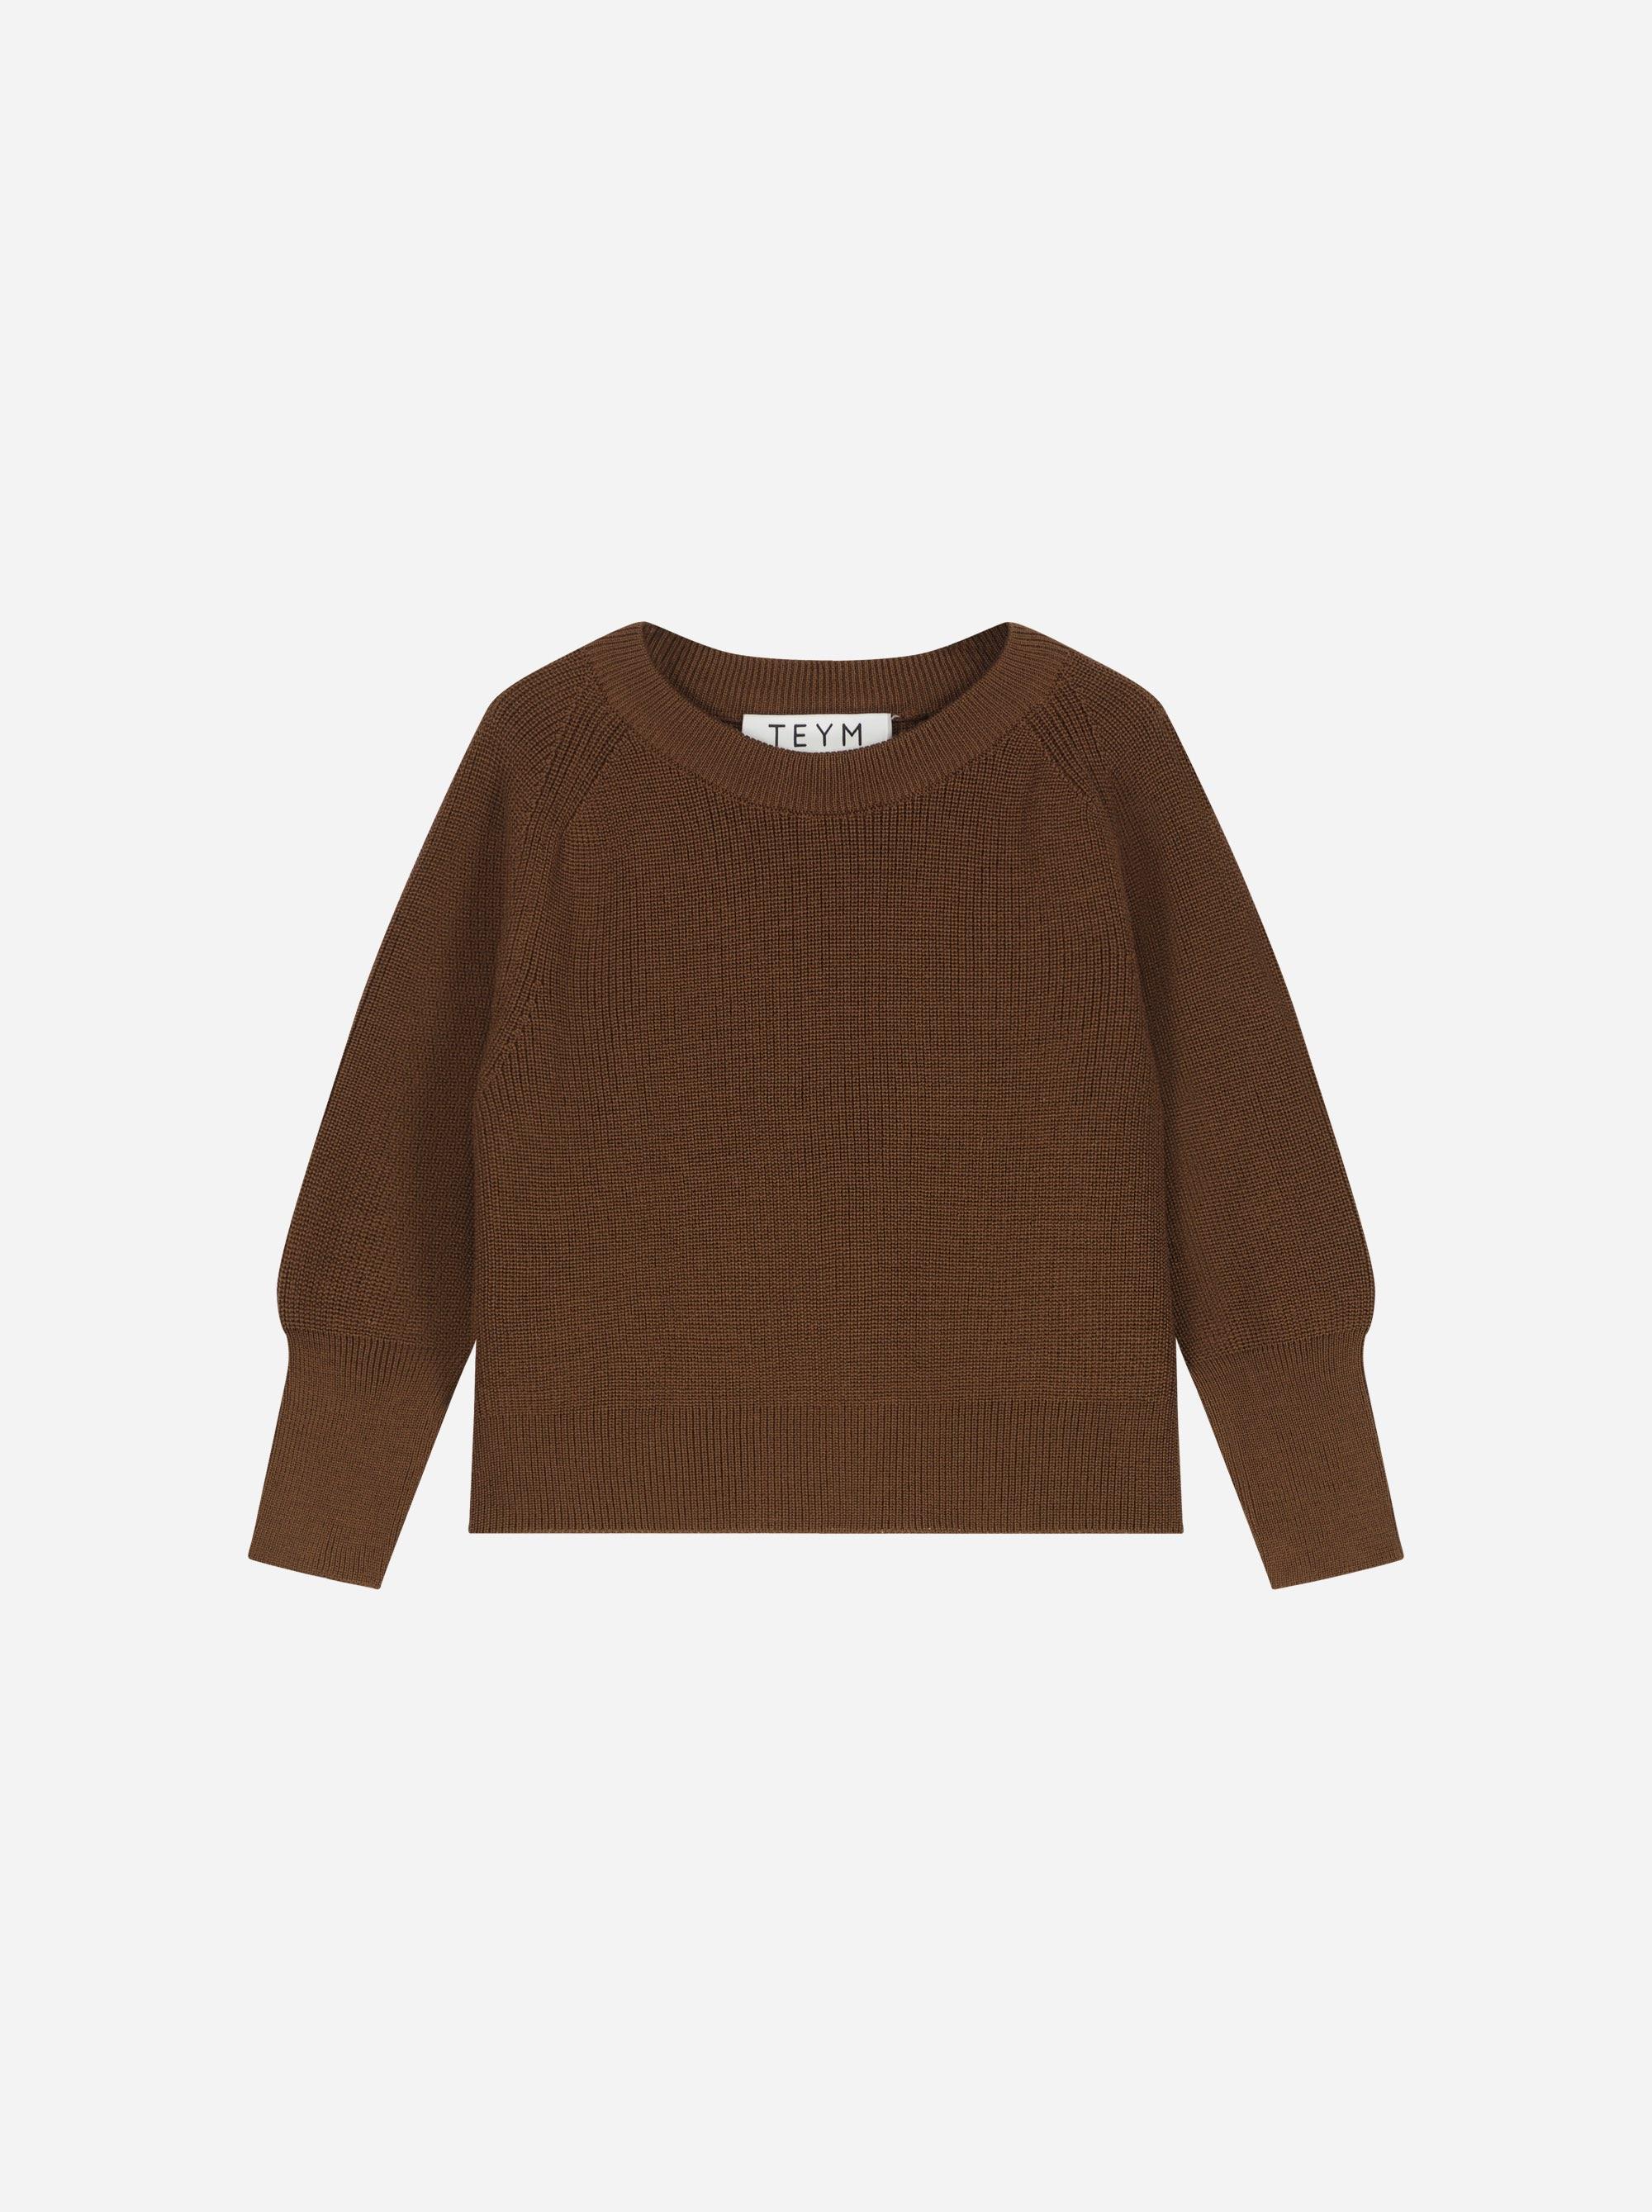 Teym_Merino Sweater_Brown_Kids_front_1